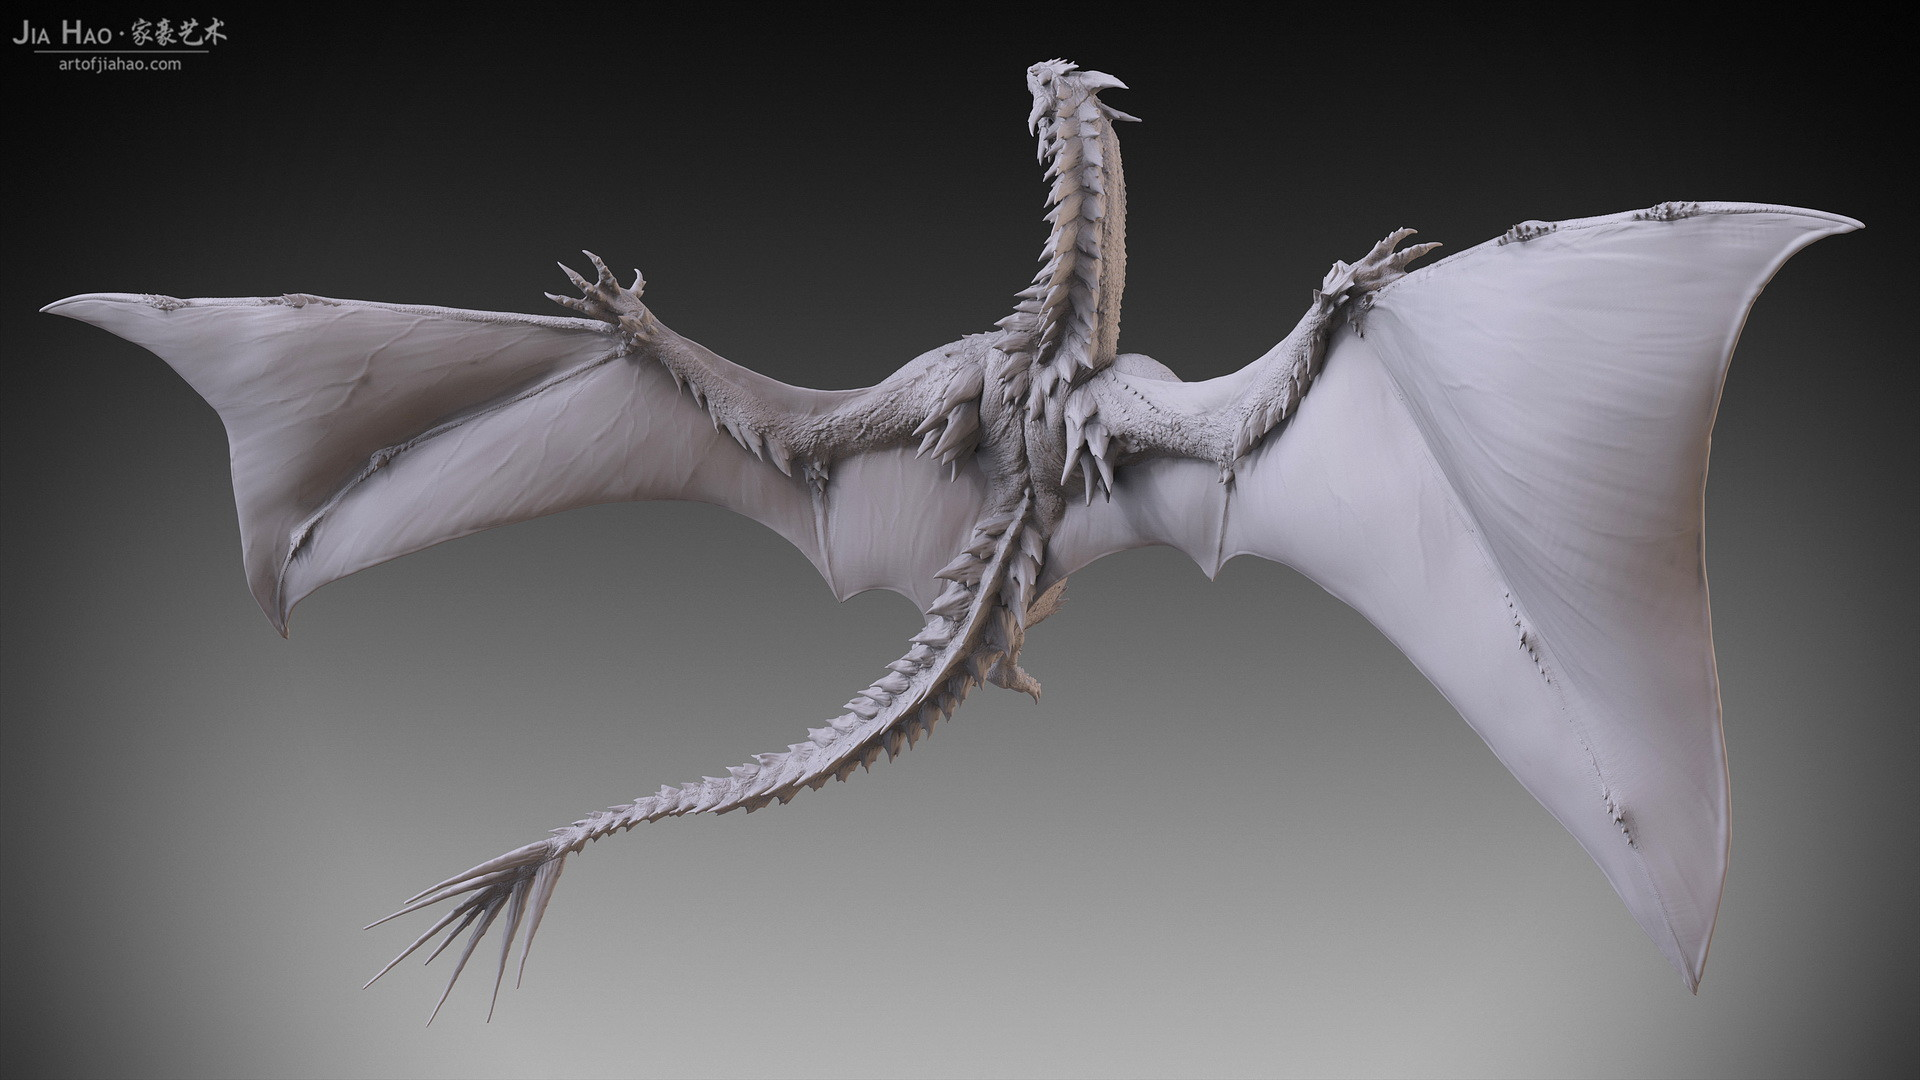 Jia hao 2017 spikydragon flying digitalsculpting 05